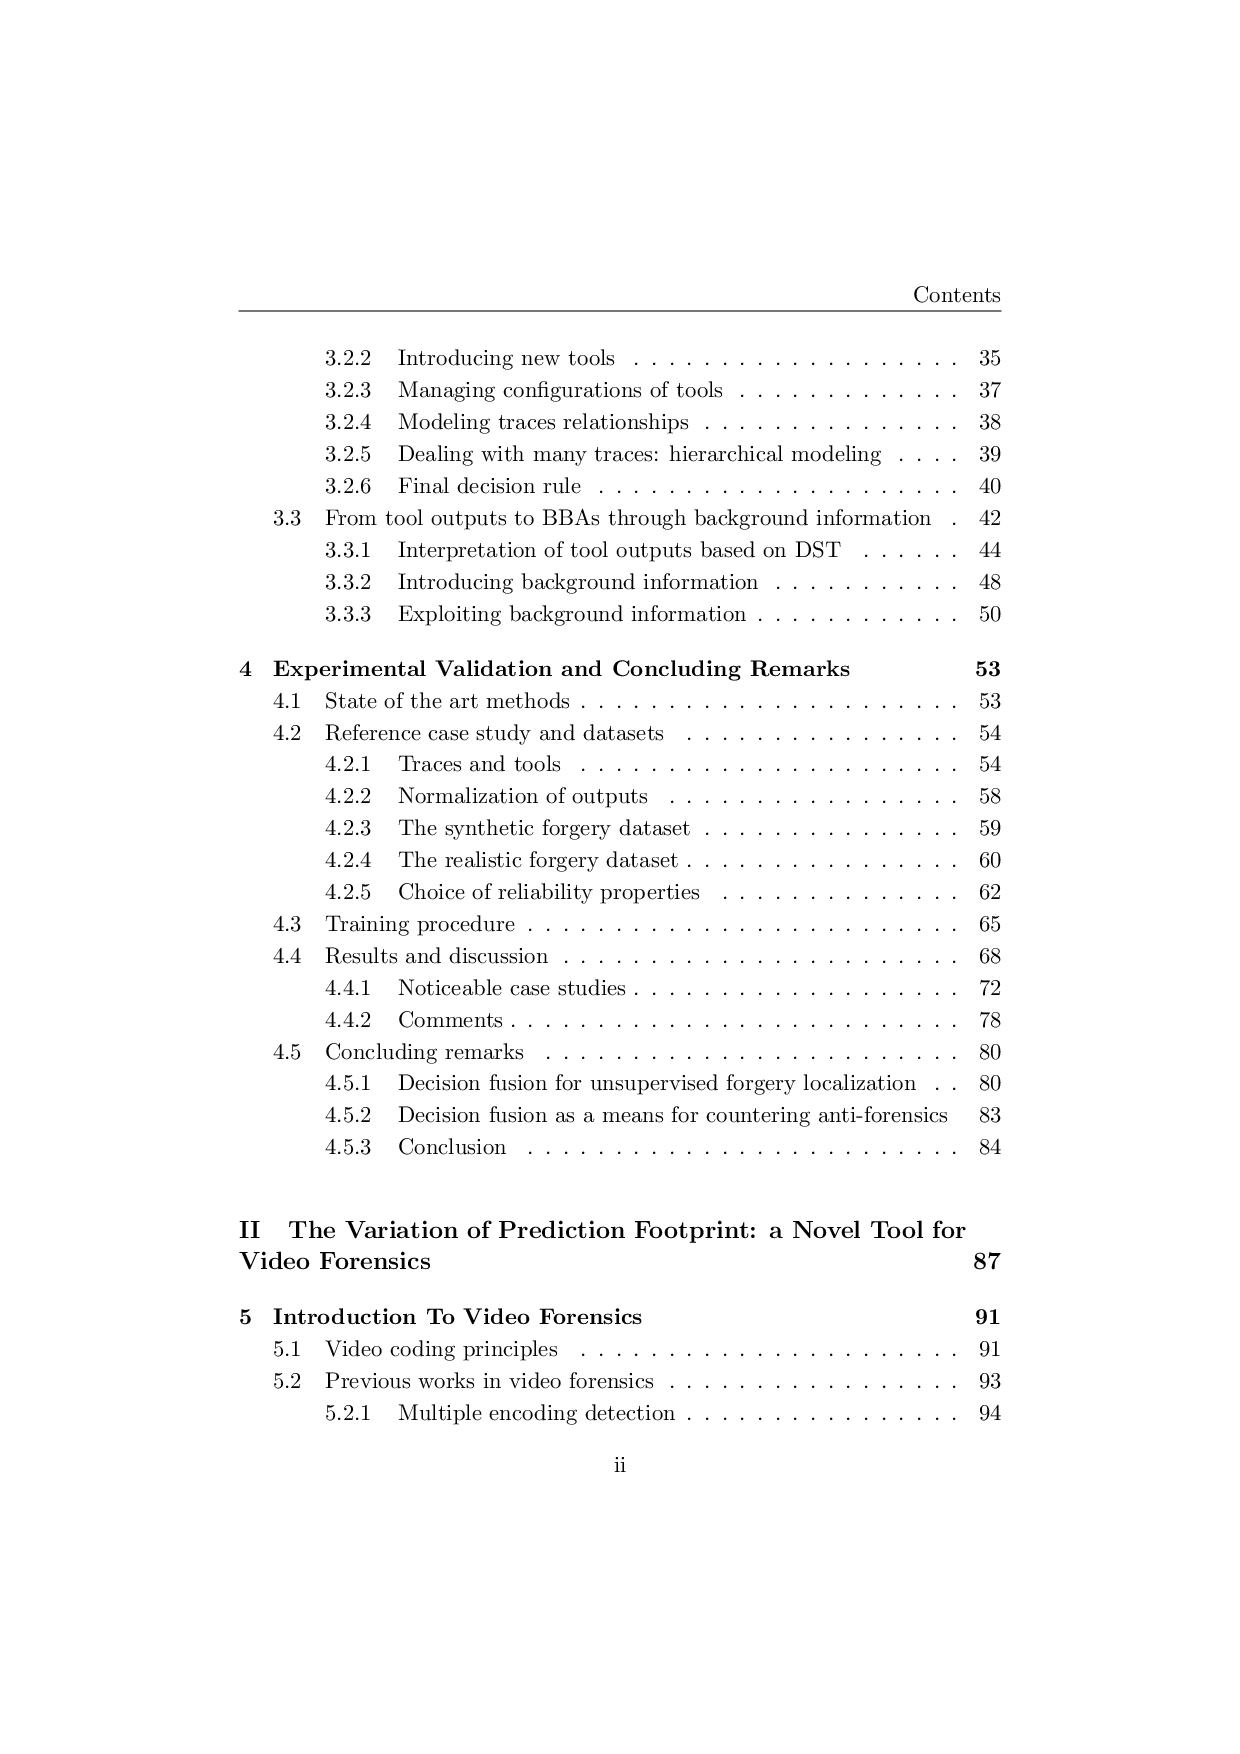 Digital forensics doctoral thesis